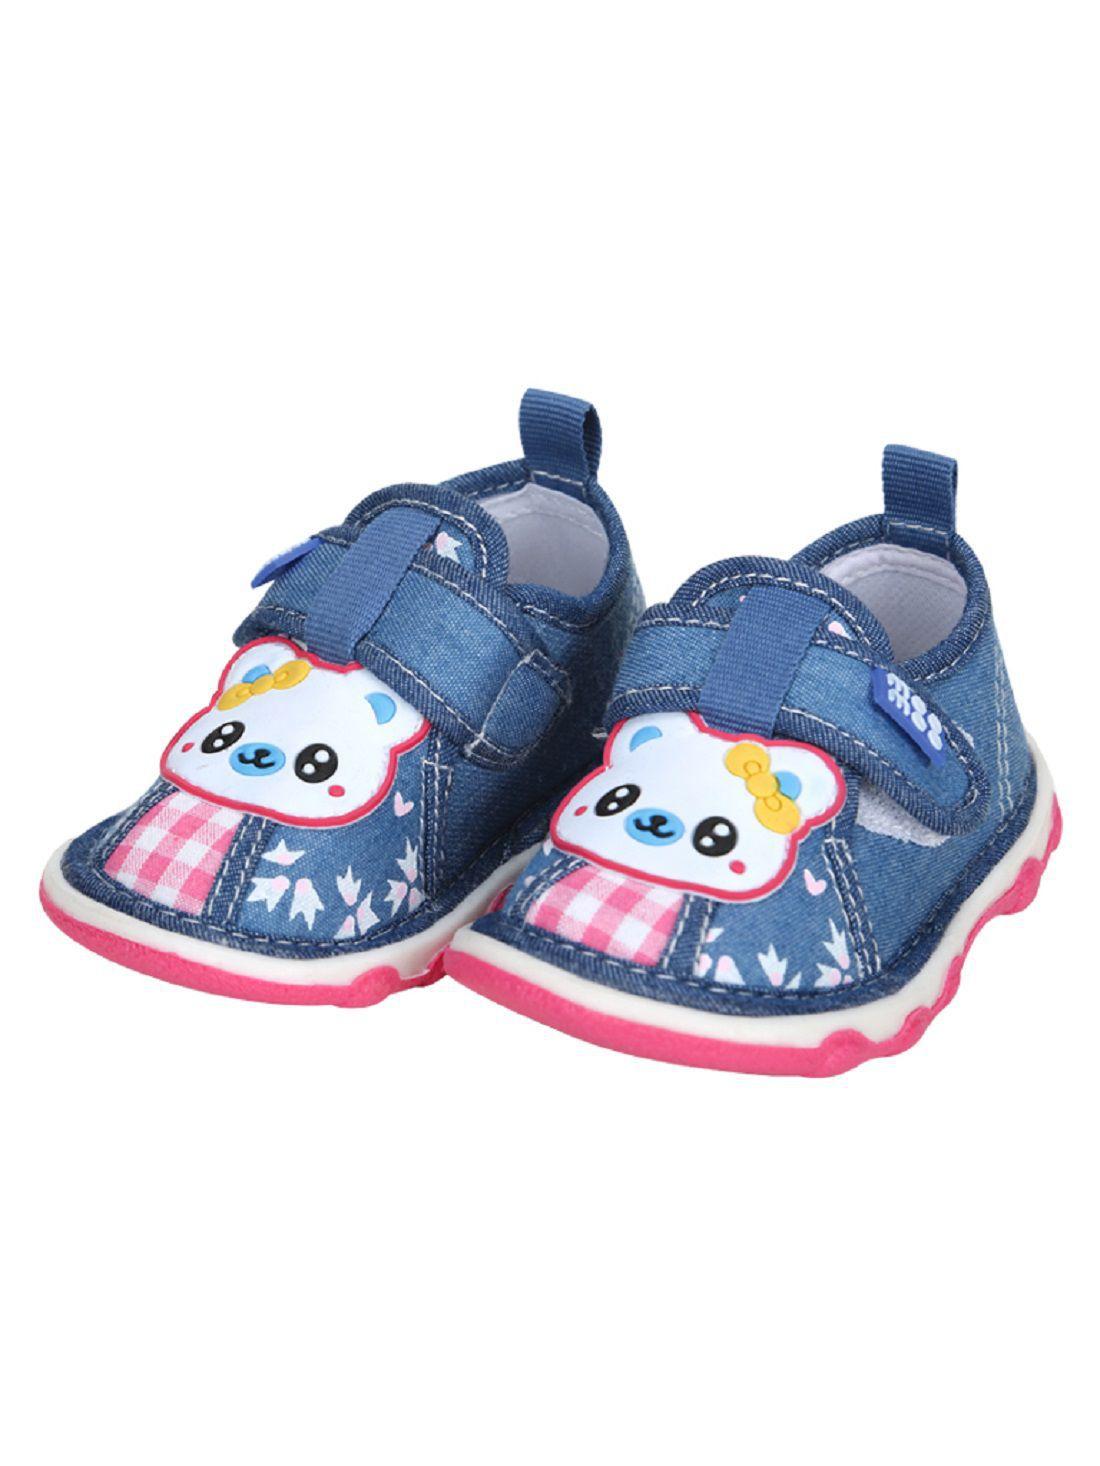 Walk Baby Shoes with Chu Chu Sound